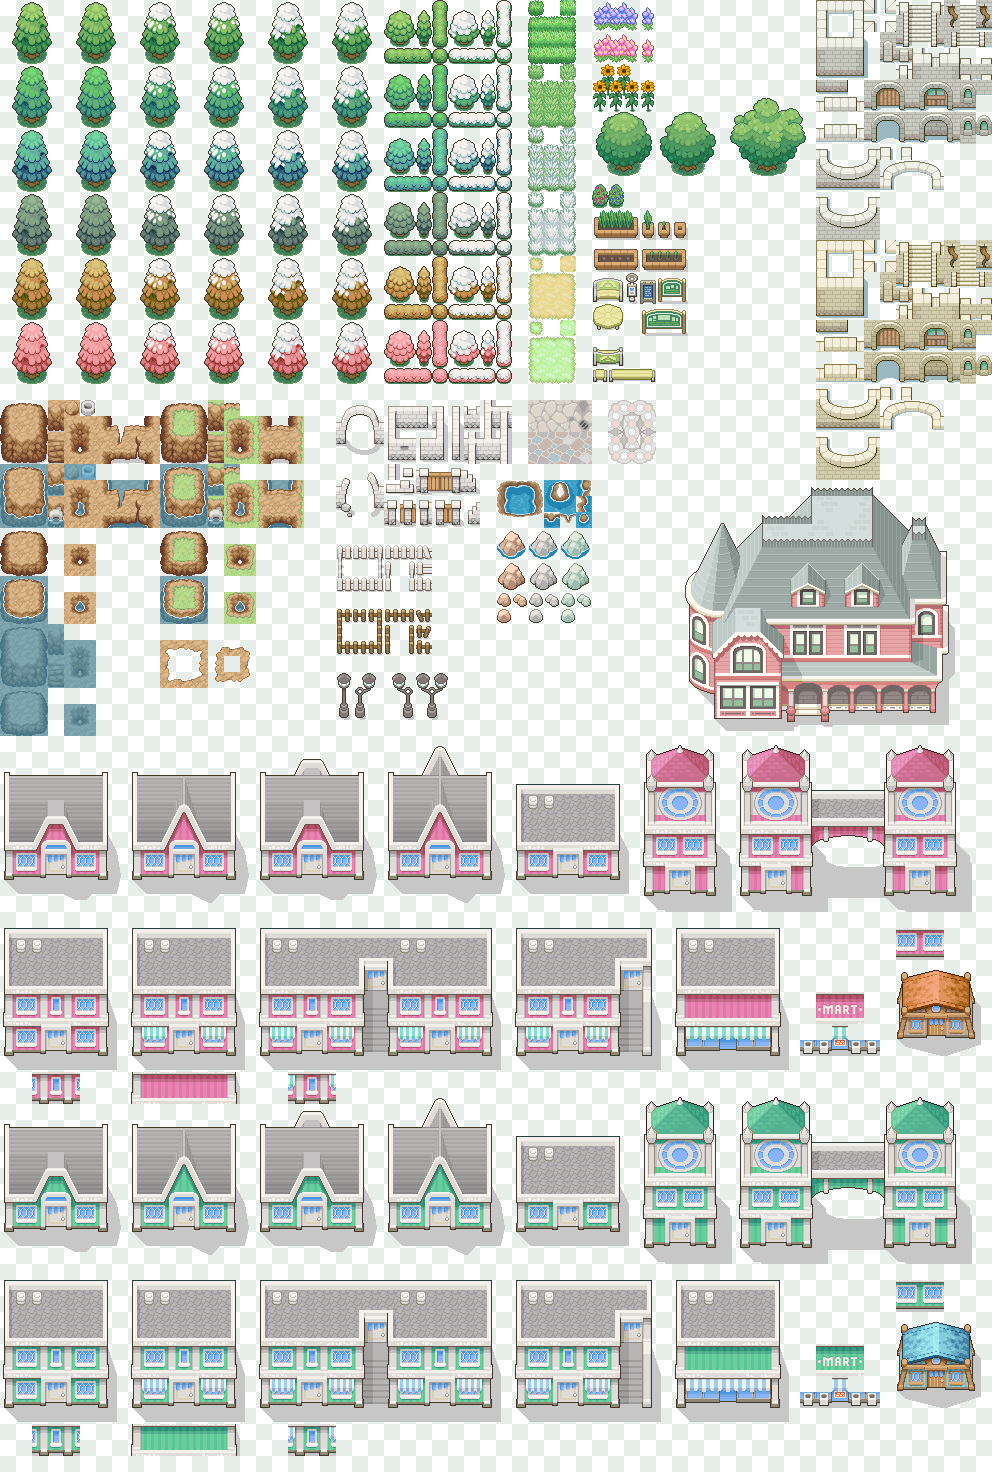 Bunch o' free tiles by Magiscarf deviantart com on @deviantART